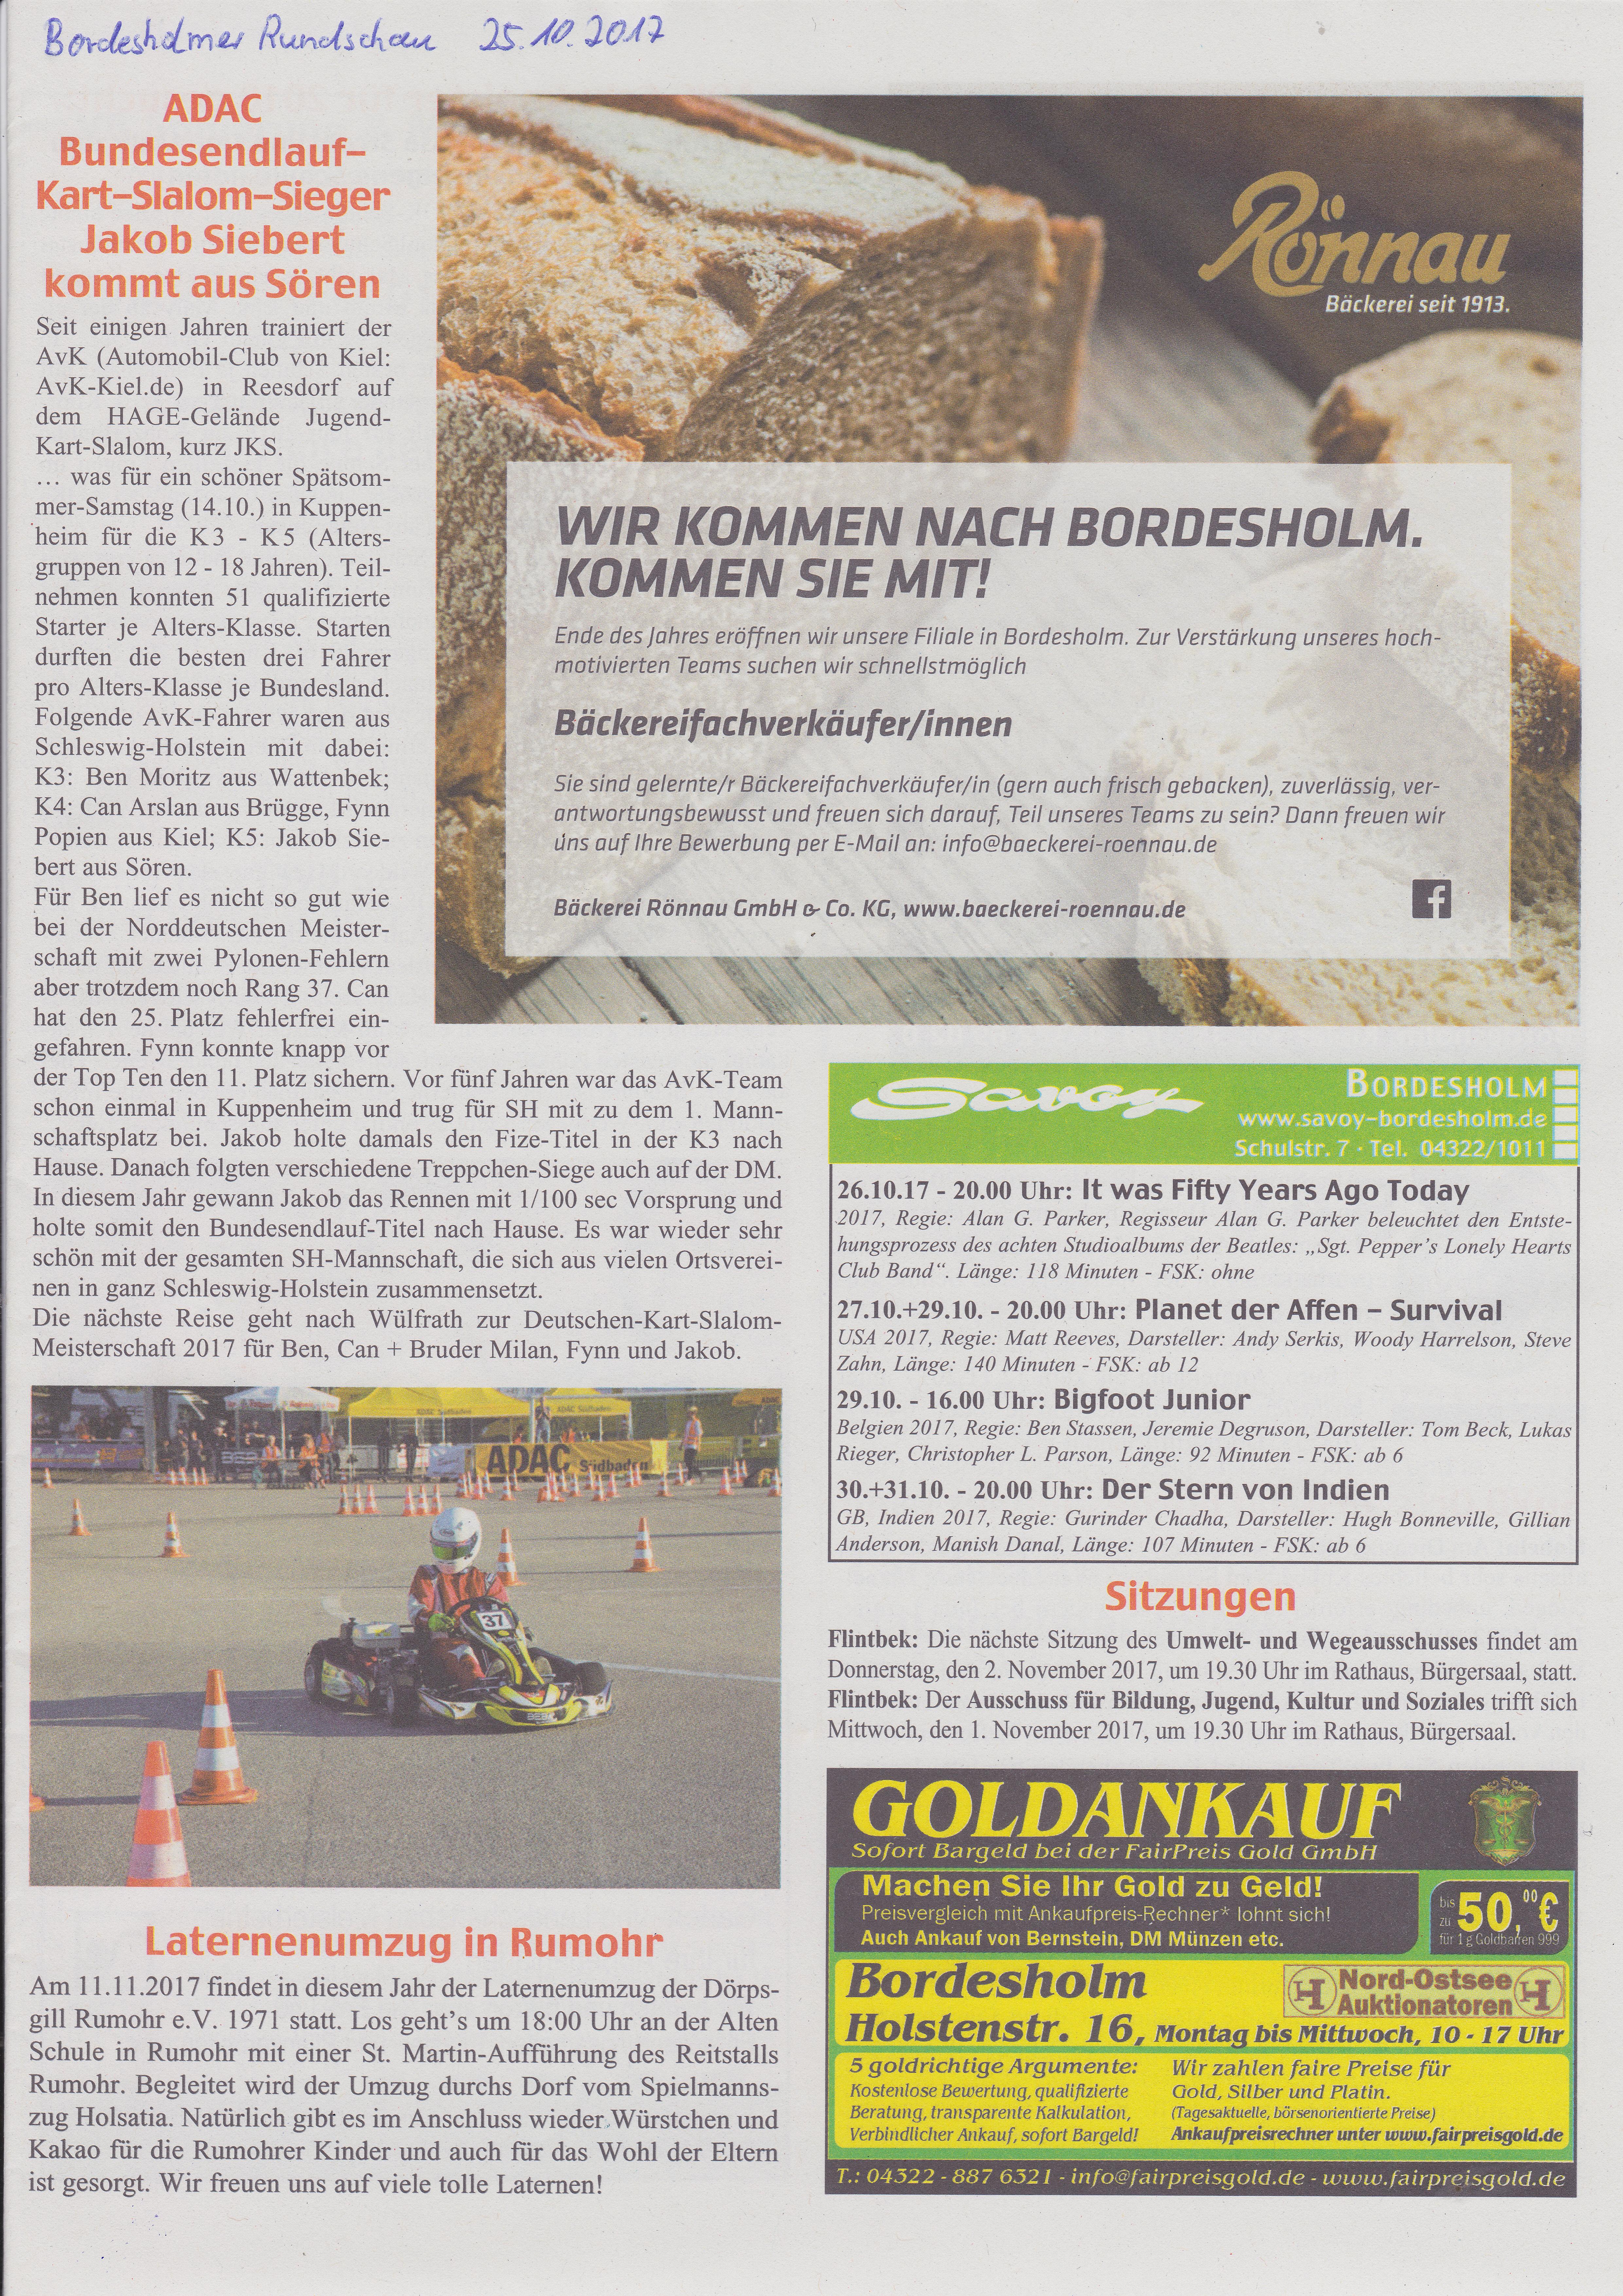 ADAC Bundesendlauf-Kart-Slalom-Sieger Jakob Siebert kommt aus Sören